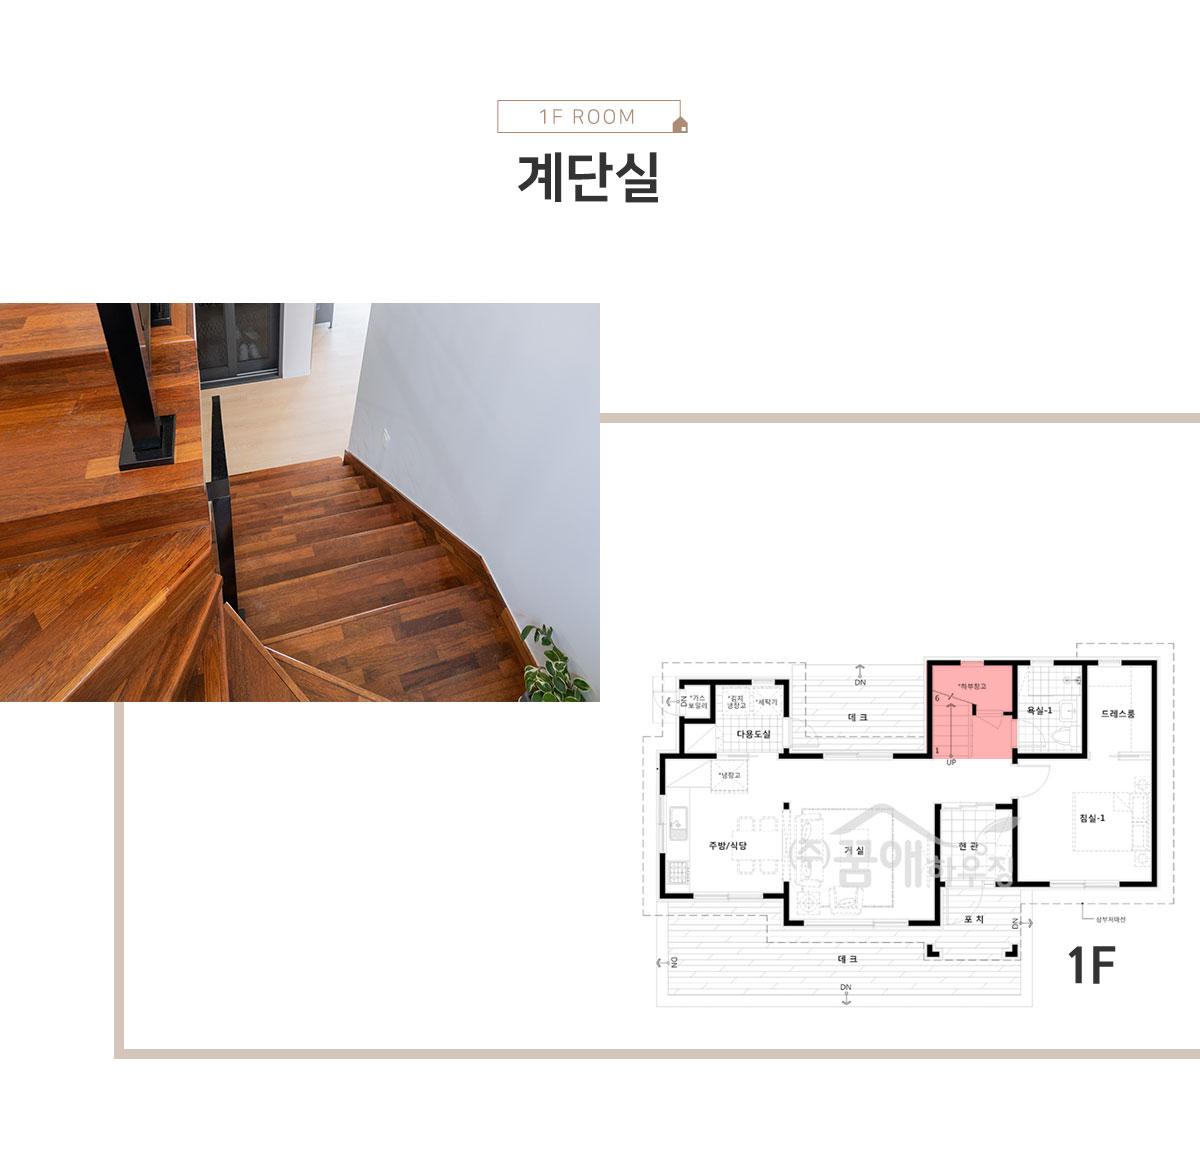 006_room_전북-진안읍-반원리_김봉례_01.jpg